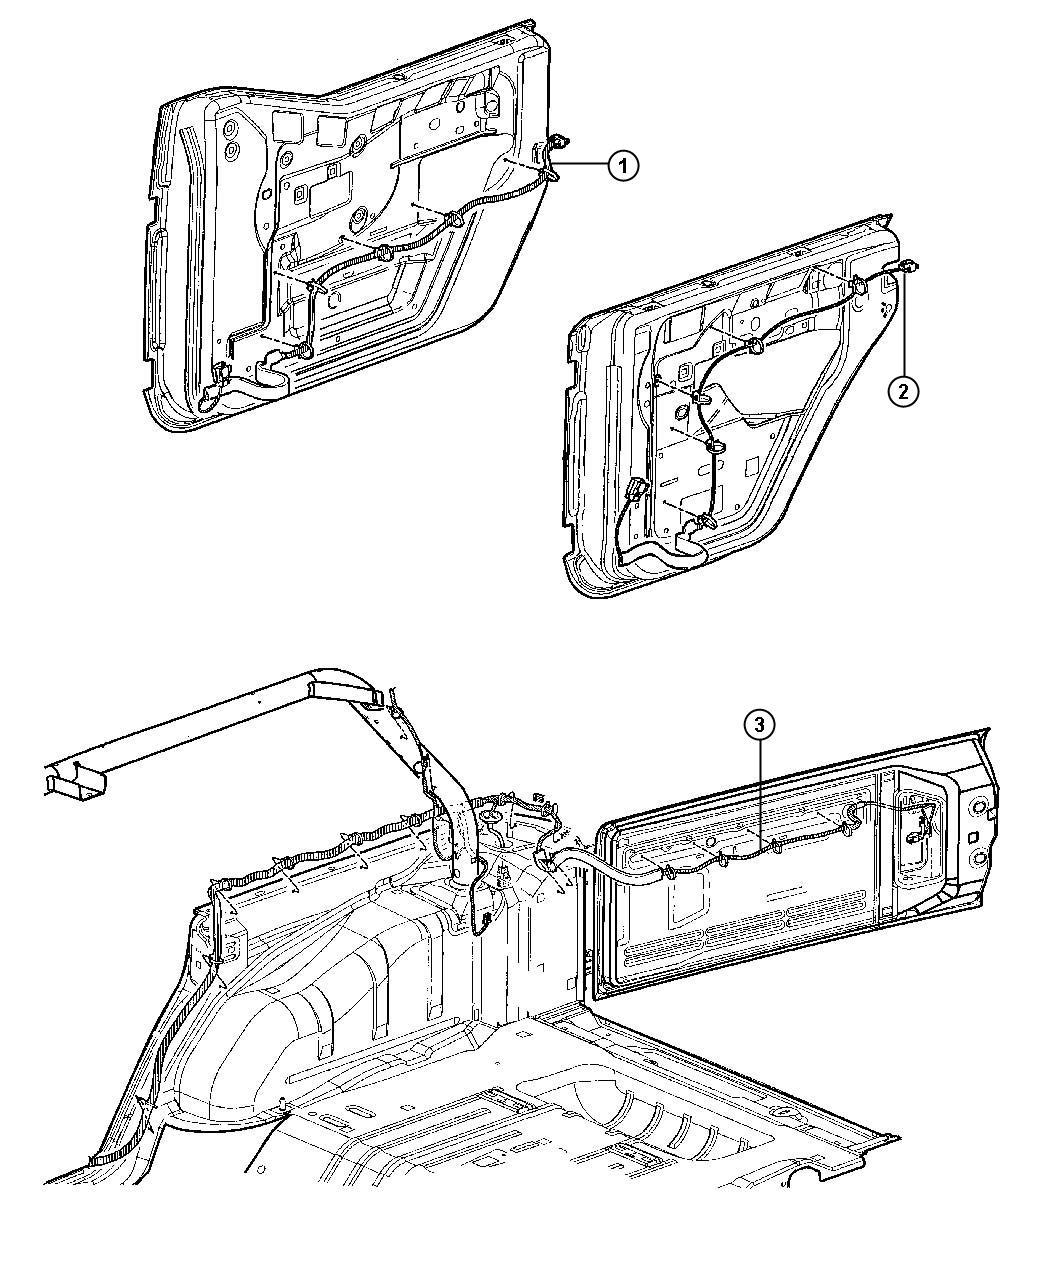 Jeep Wrangler Wiring. Rear door. Right. Windows, manual